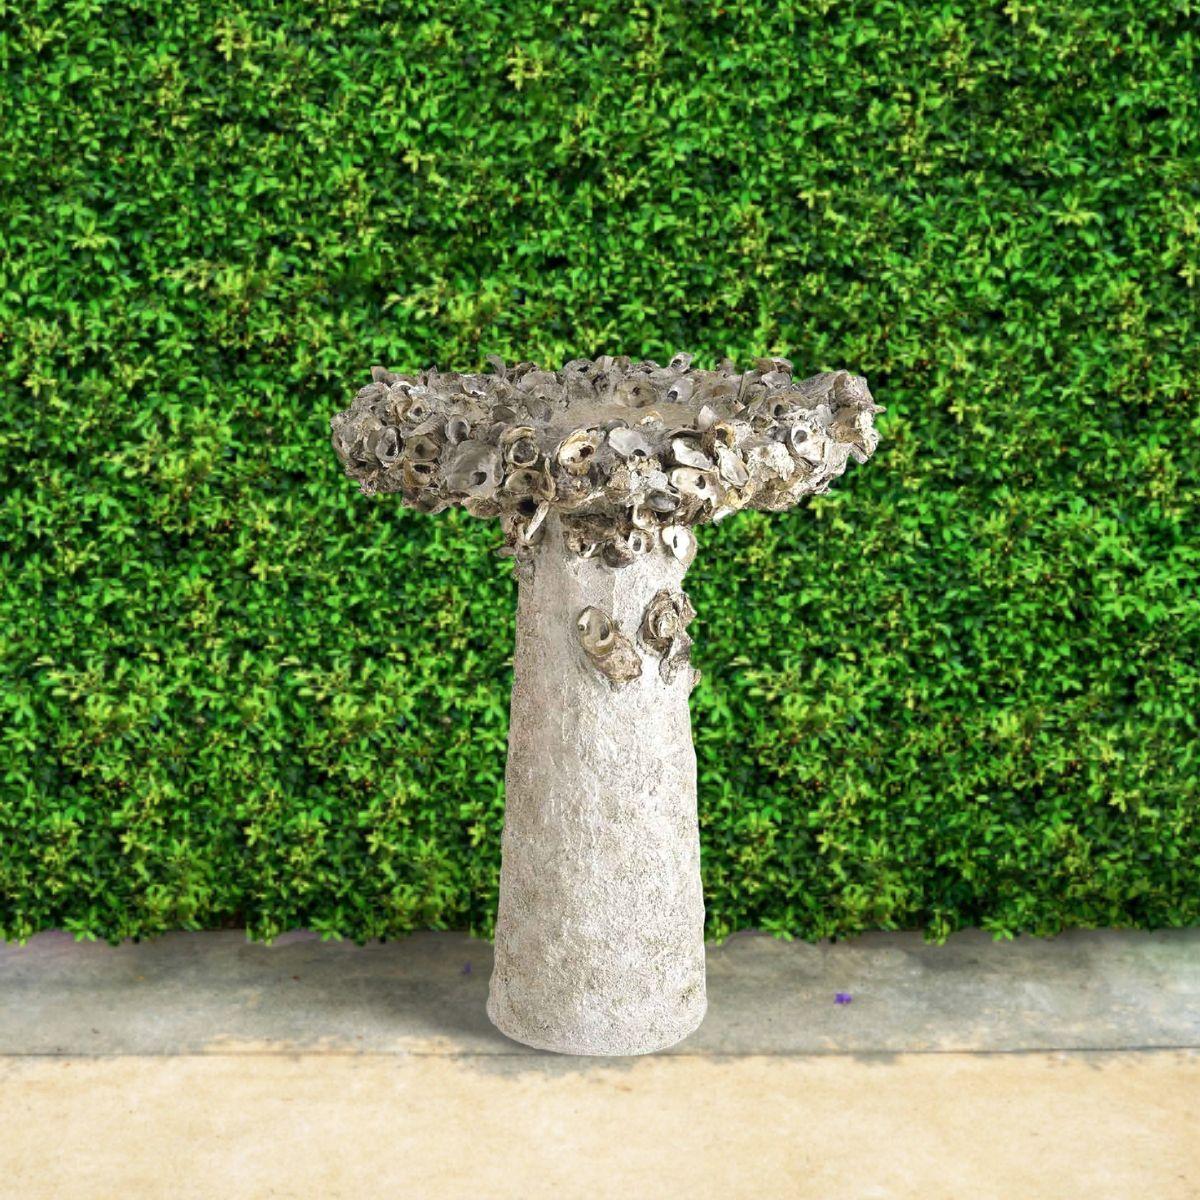 oyster-shell-birdbath-fountain-outdoors